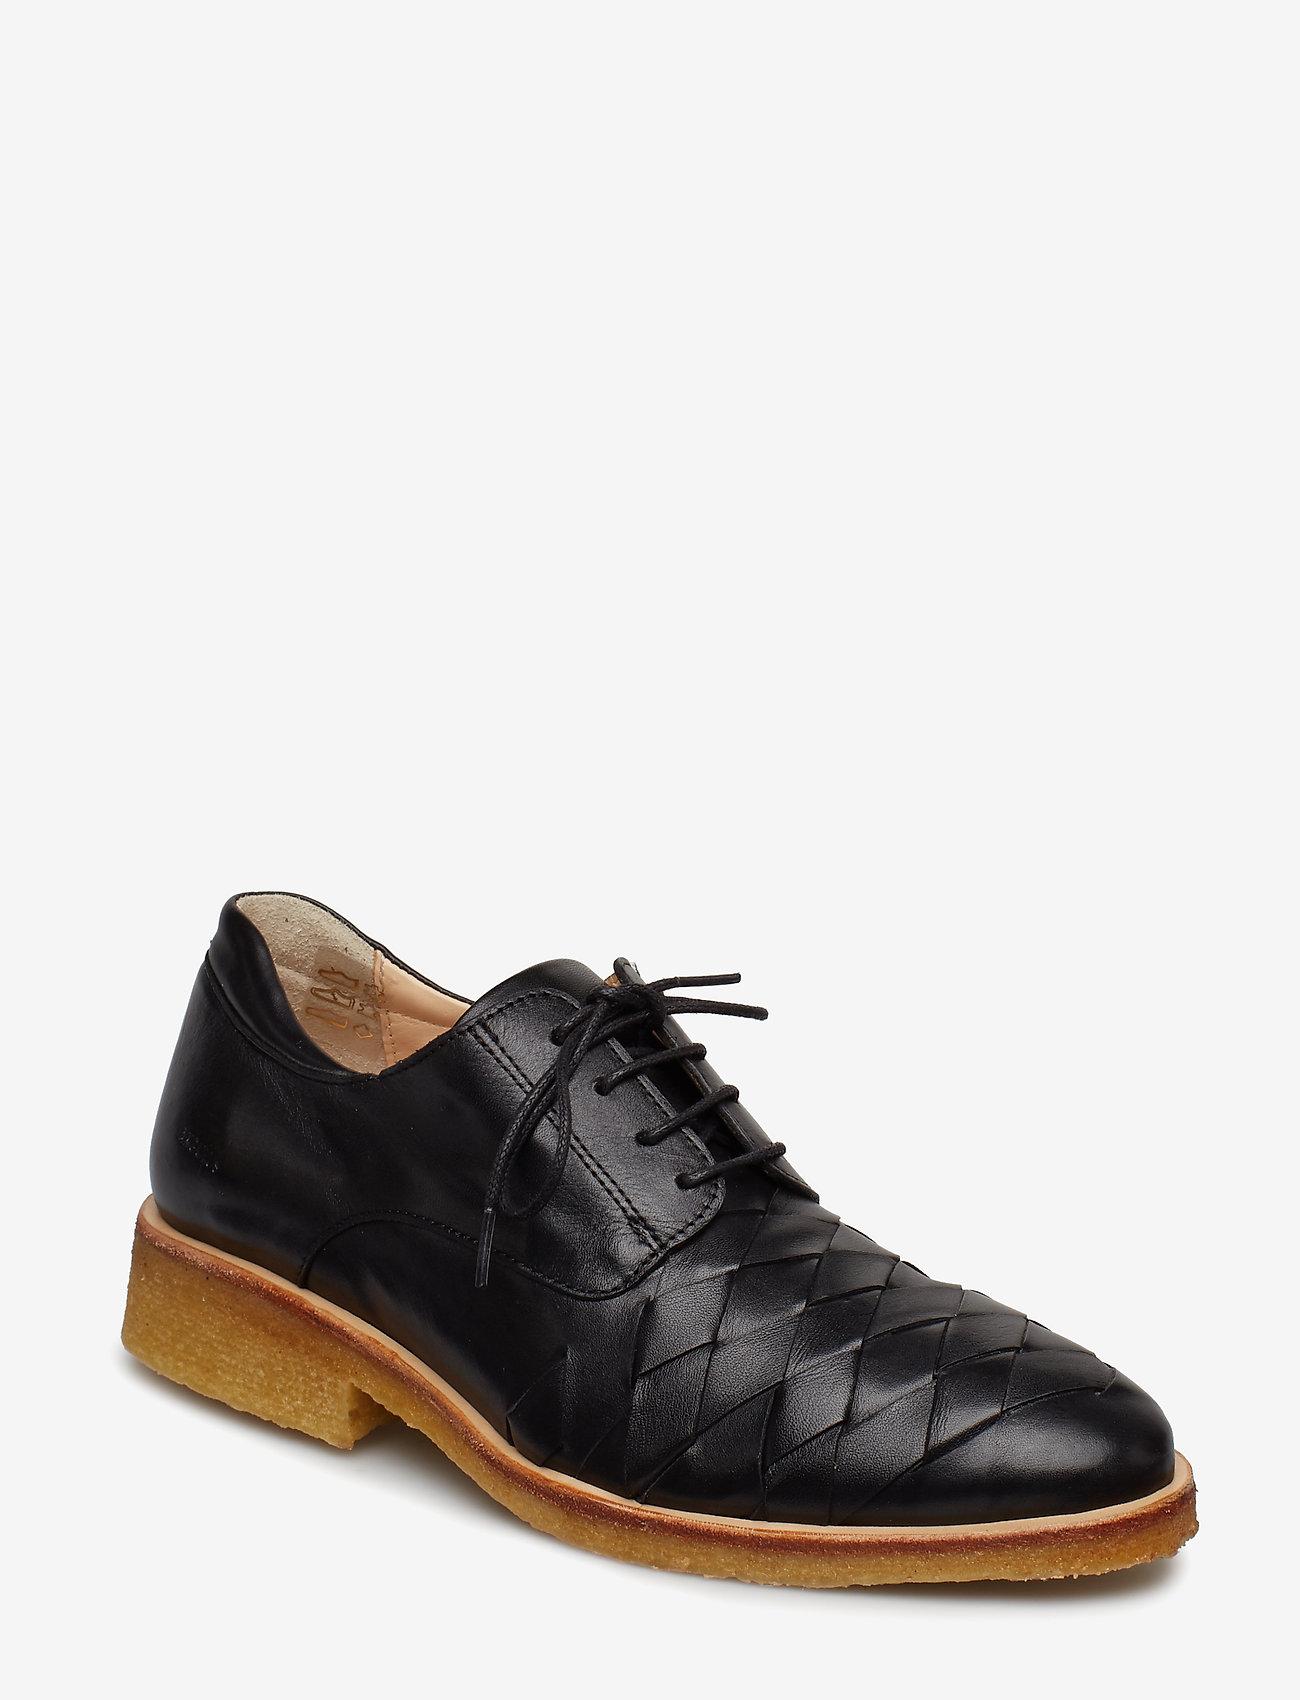 ANGULUS - Shoes - flat - schnürschuhe - 1604 black - 0